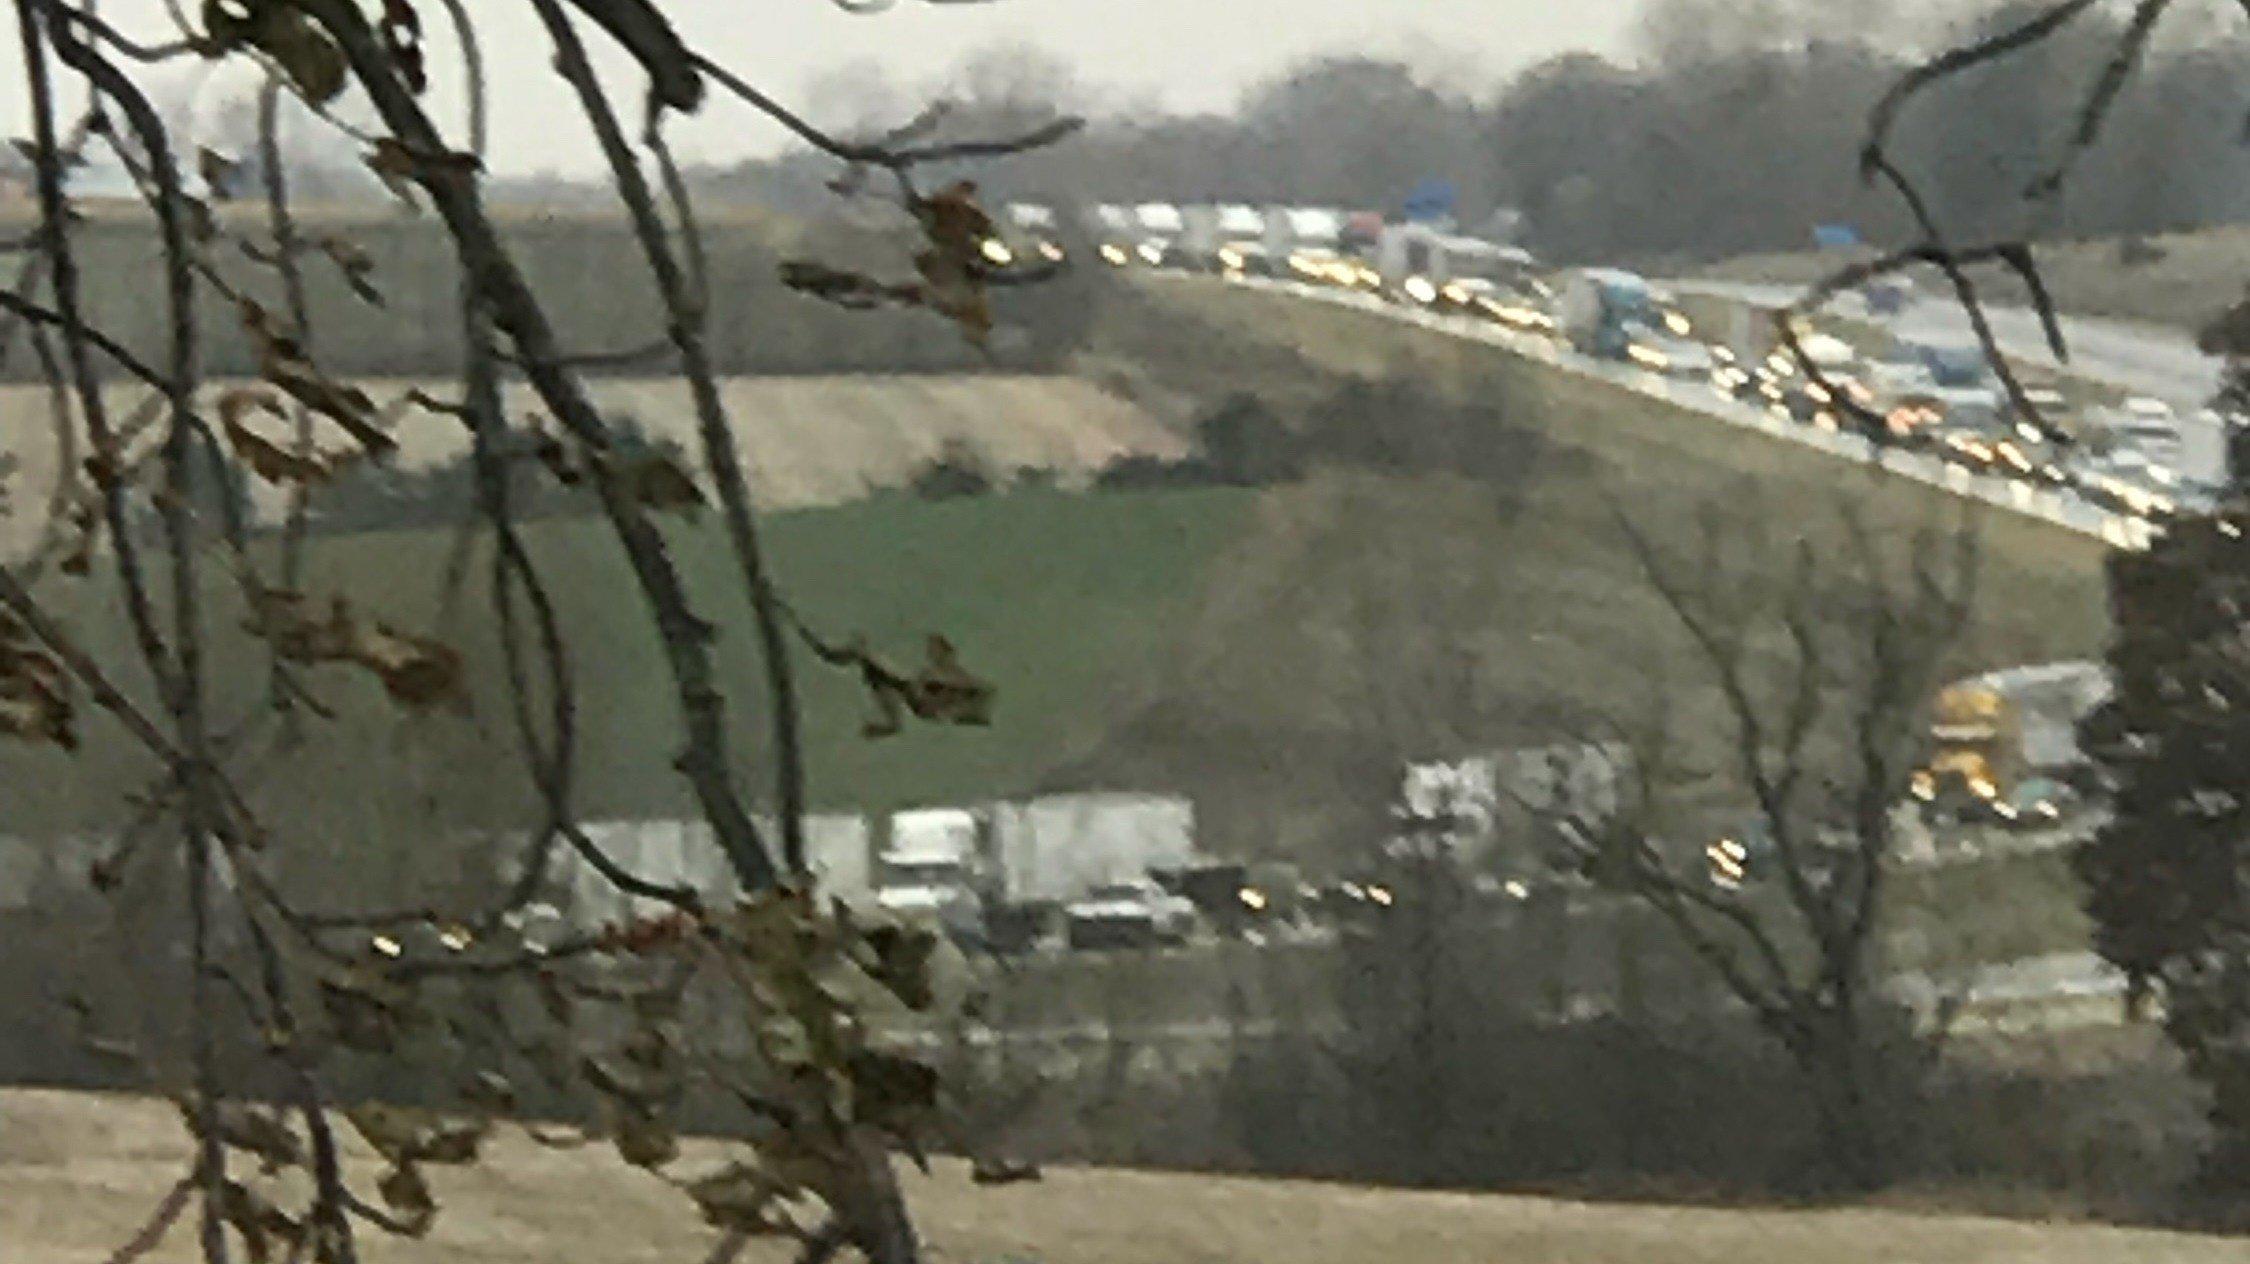 A crash on I-90 near Nodine slowed traffic there Saturday morning (Photo by Louie Literski)